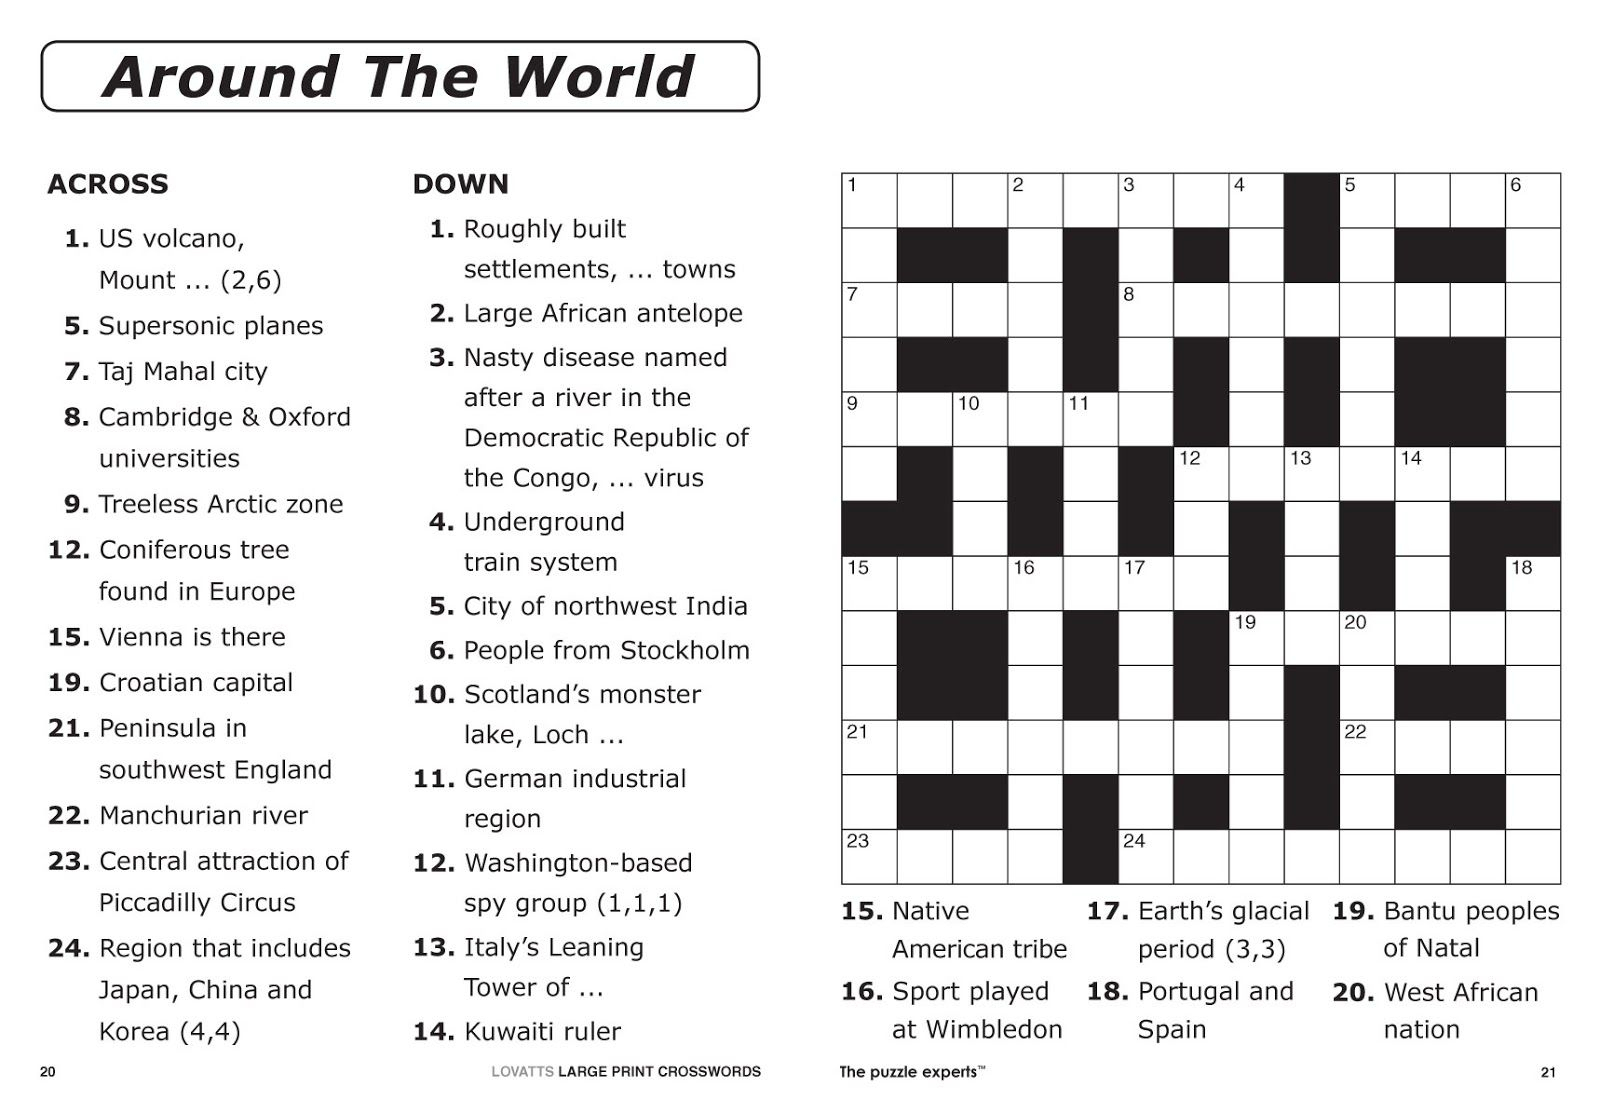 Easy Printable Crossword Puzzles | Elder Care & Dementia Care - Free - Printable Crossword Puzzle With Clues